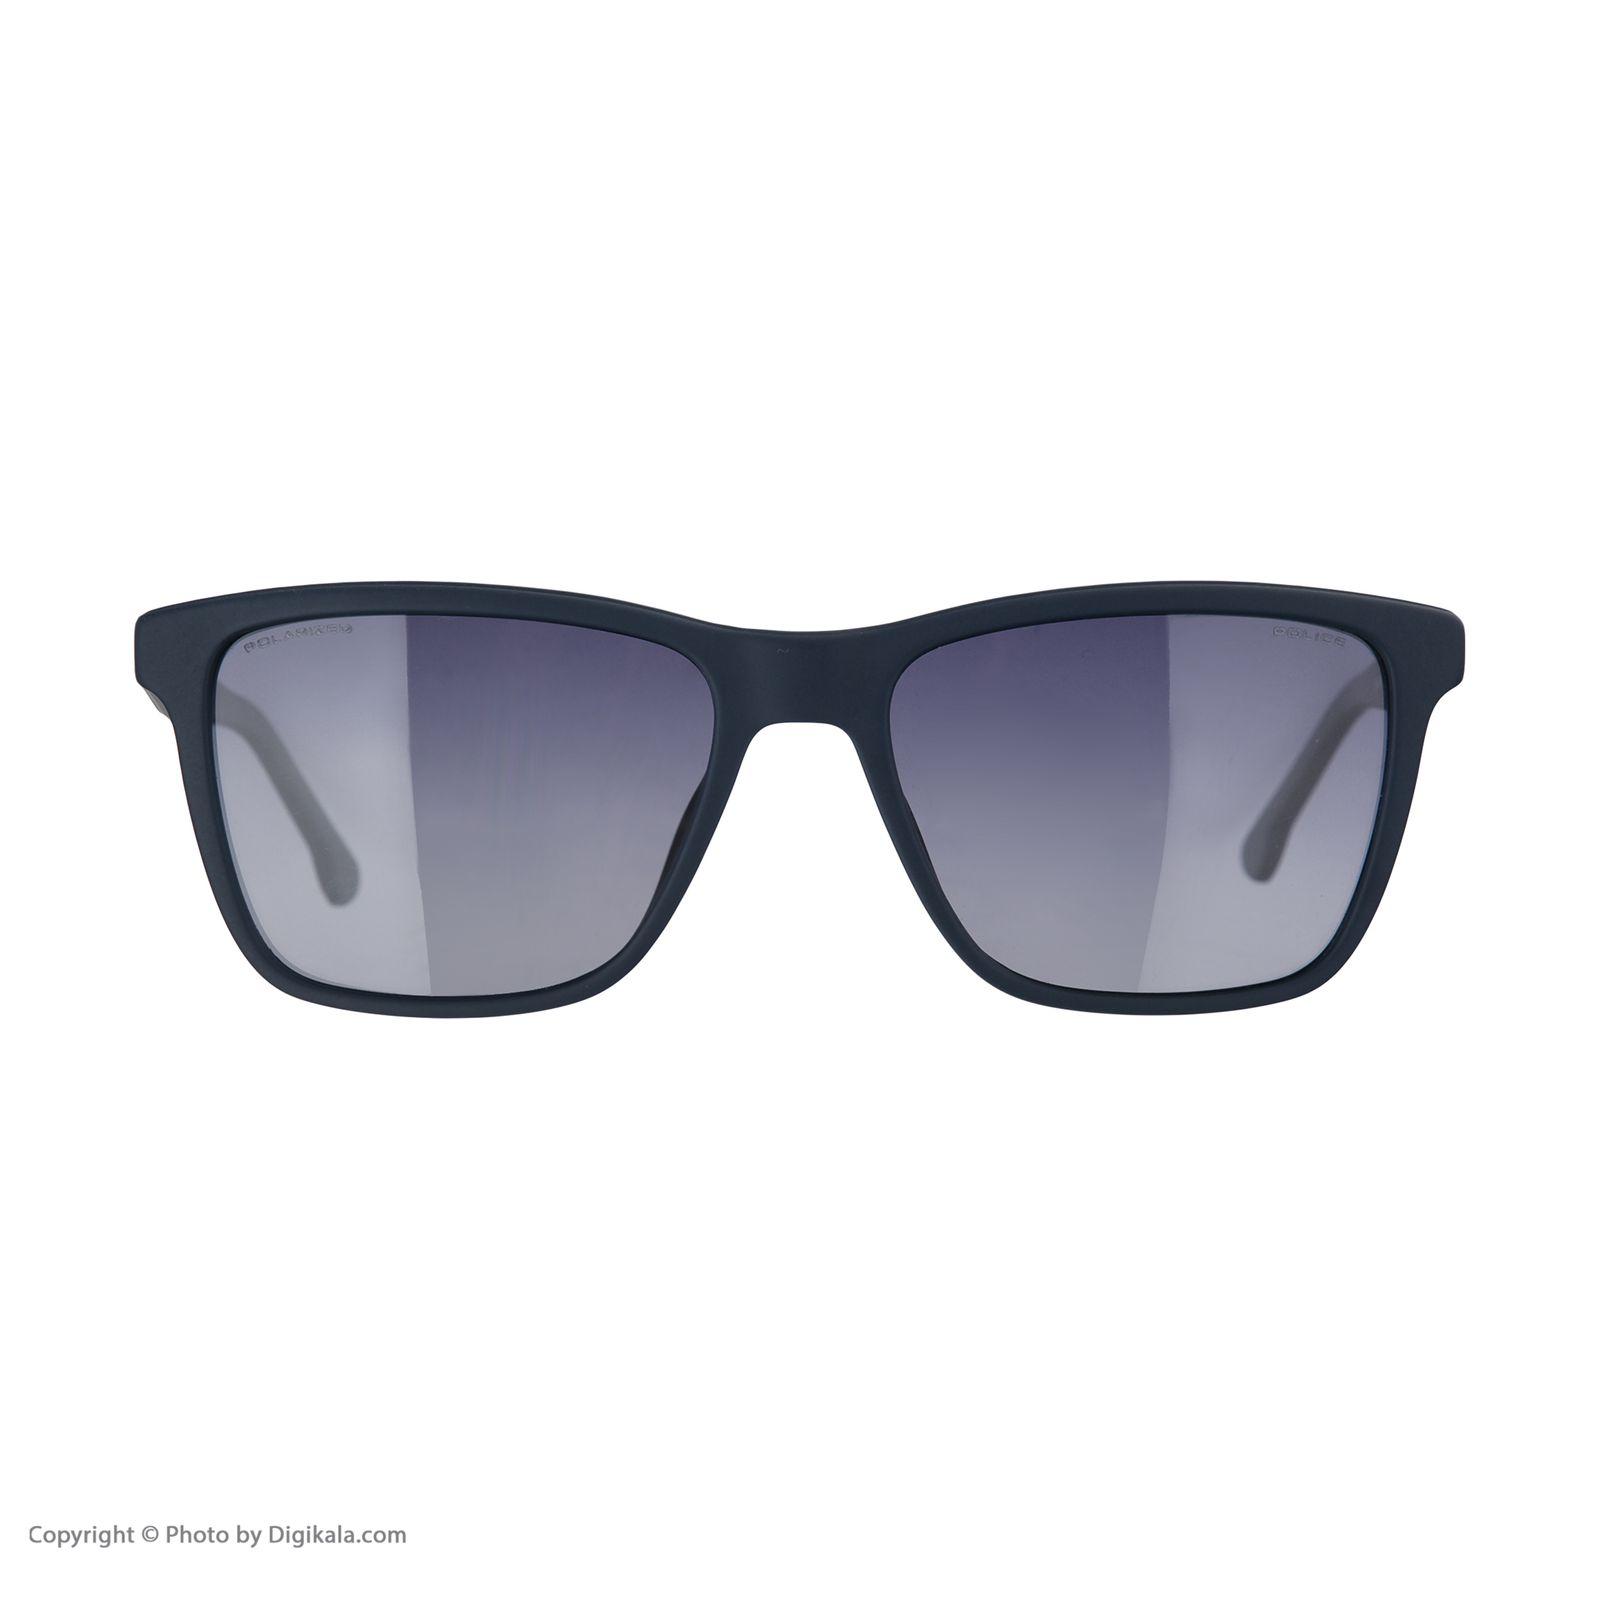 عینک آفتابی پلیس مدل SPL868M 477P -  - 3